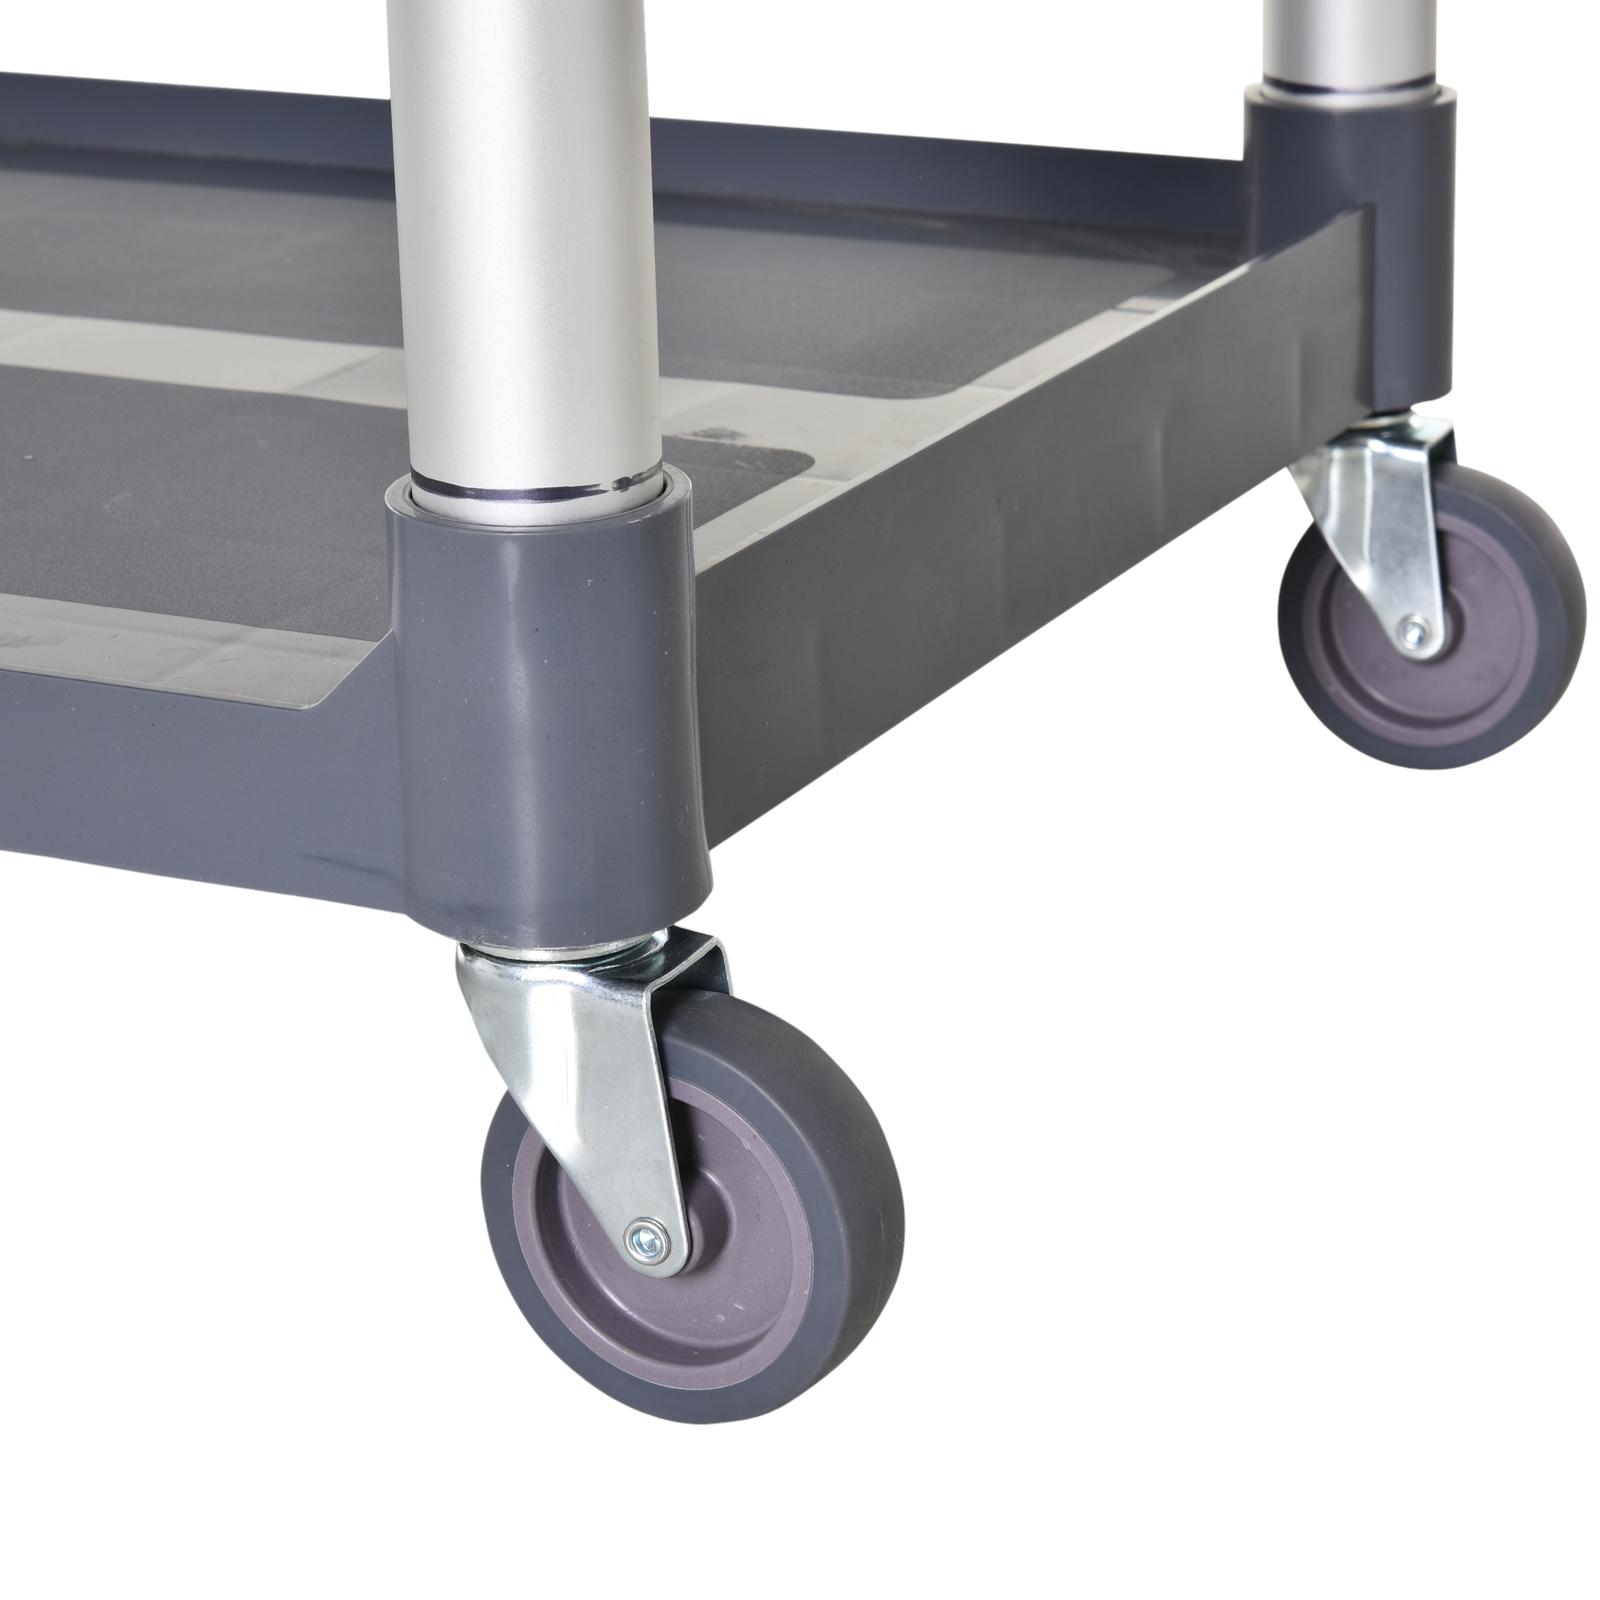 HOMCOM-3-Tier-Metal-Trolley-Serving-Cart-Free-Moving-Kitchen-Livingroom thumbnail 9